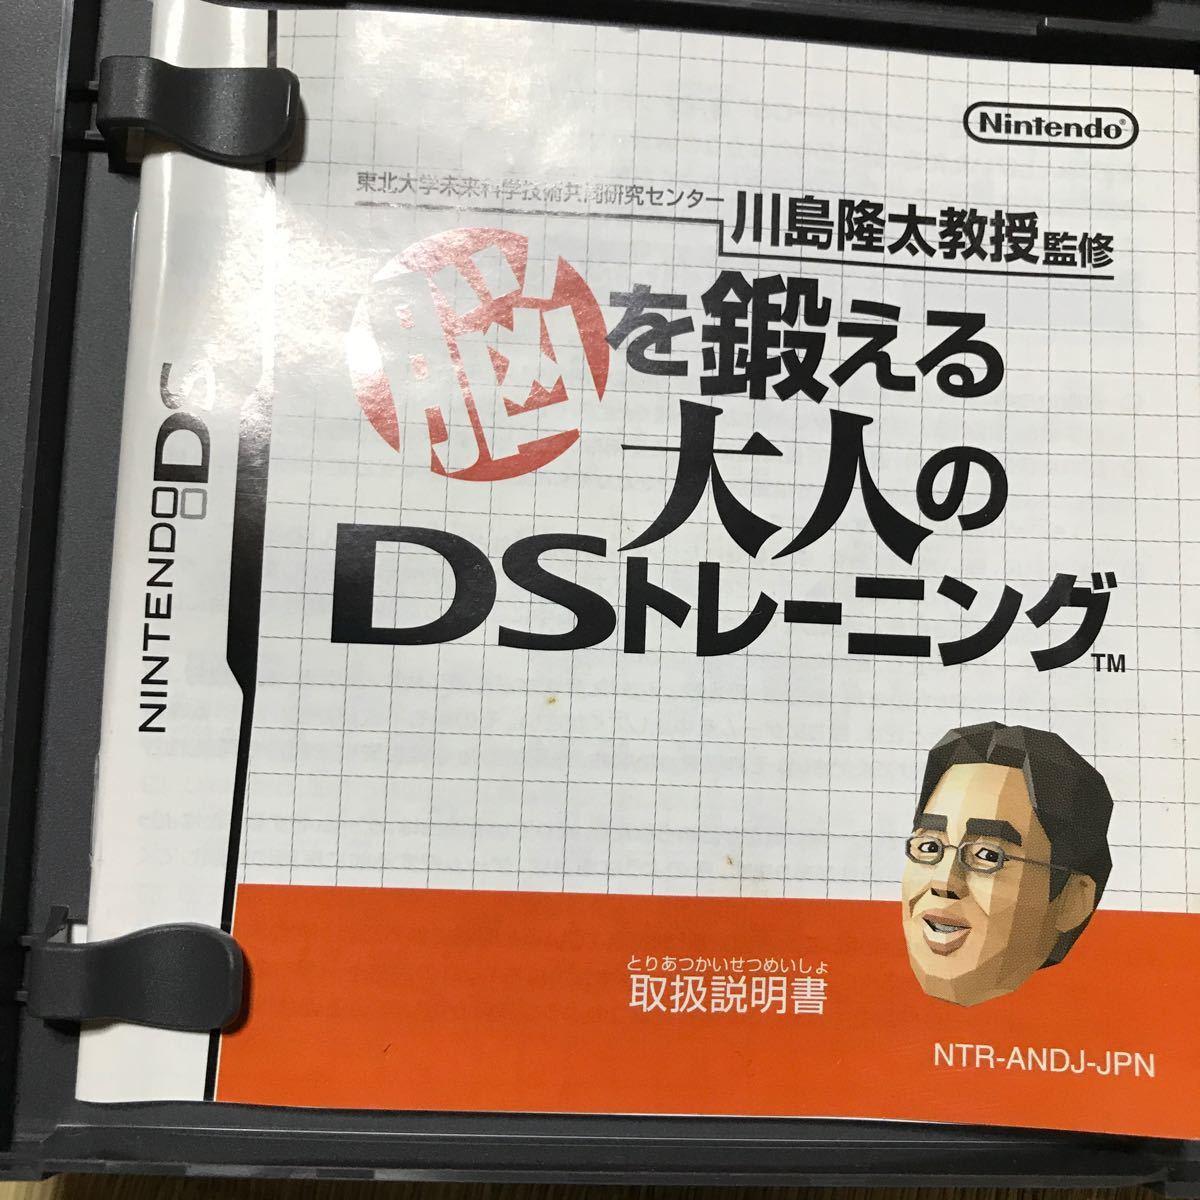 【DS】 東北大学未来科学技術共同研究センター川島隆太教授監修 脳を鍛える大人のDSトレーニング